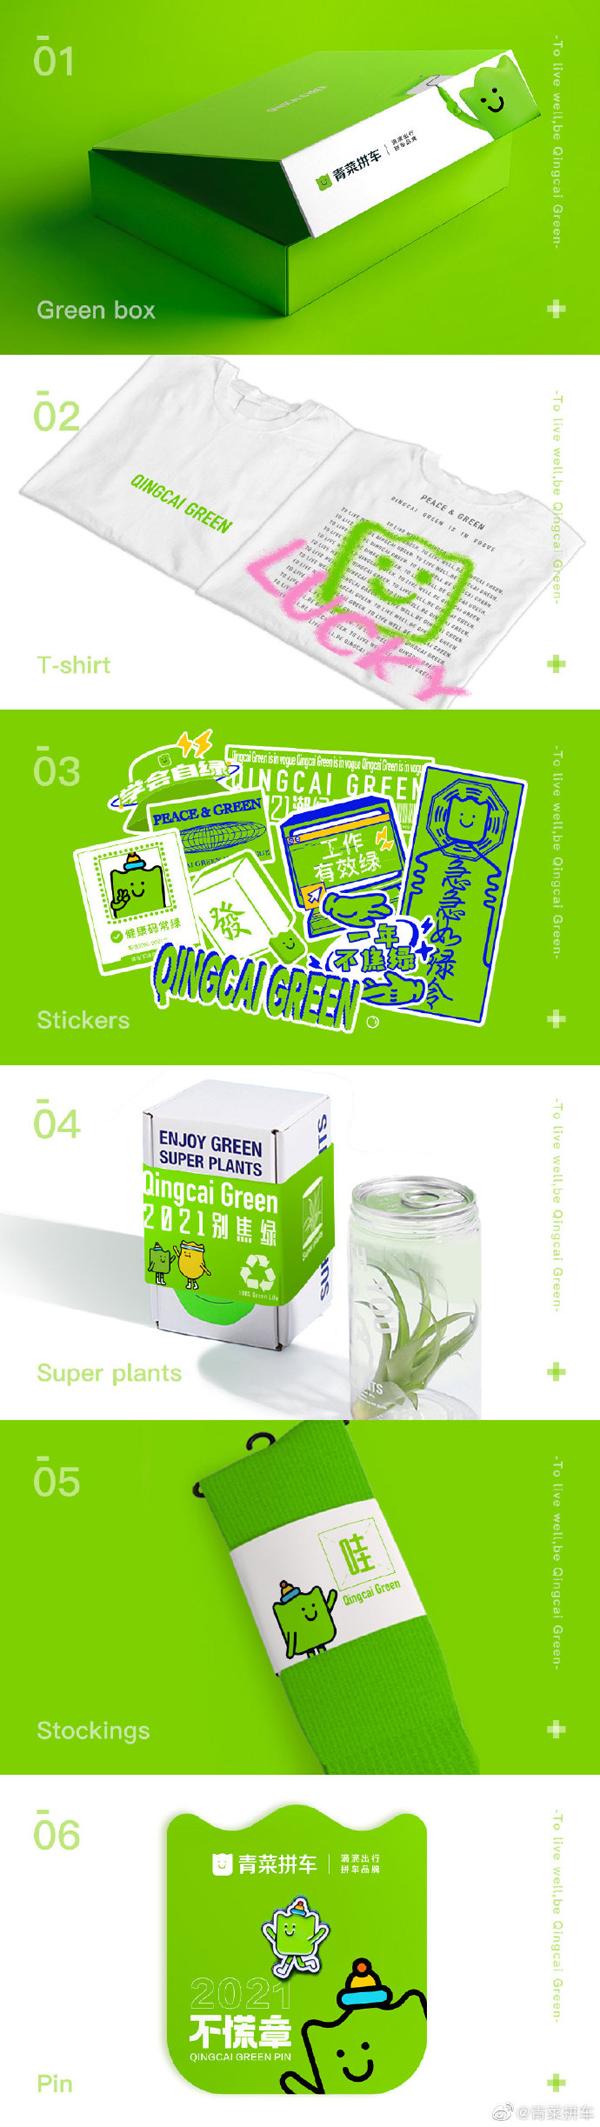 green fashion design 青菜绿周边设计